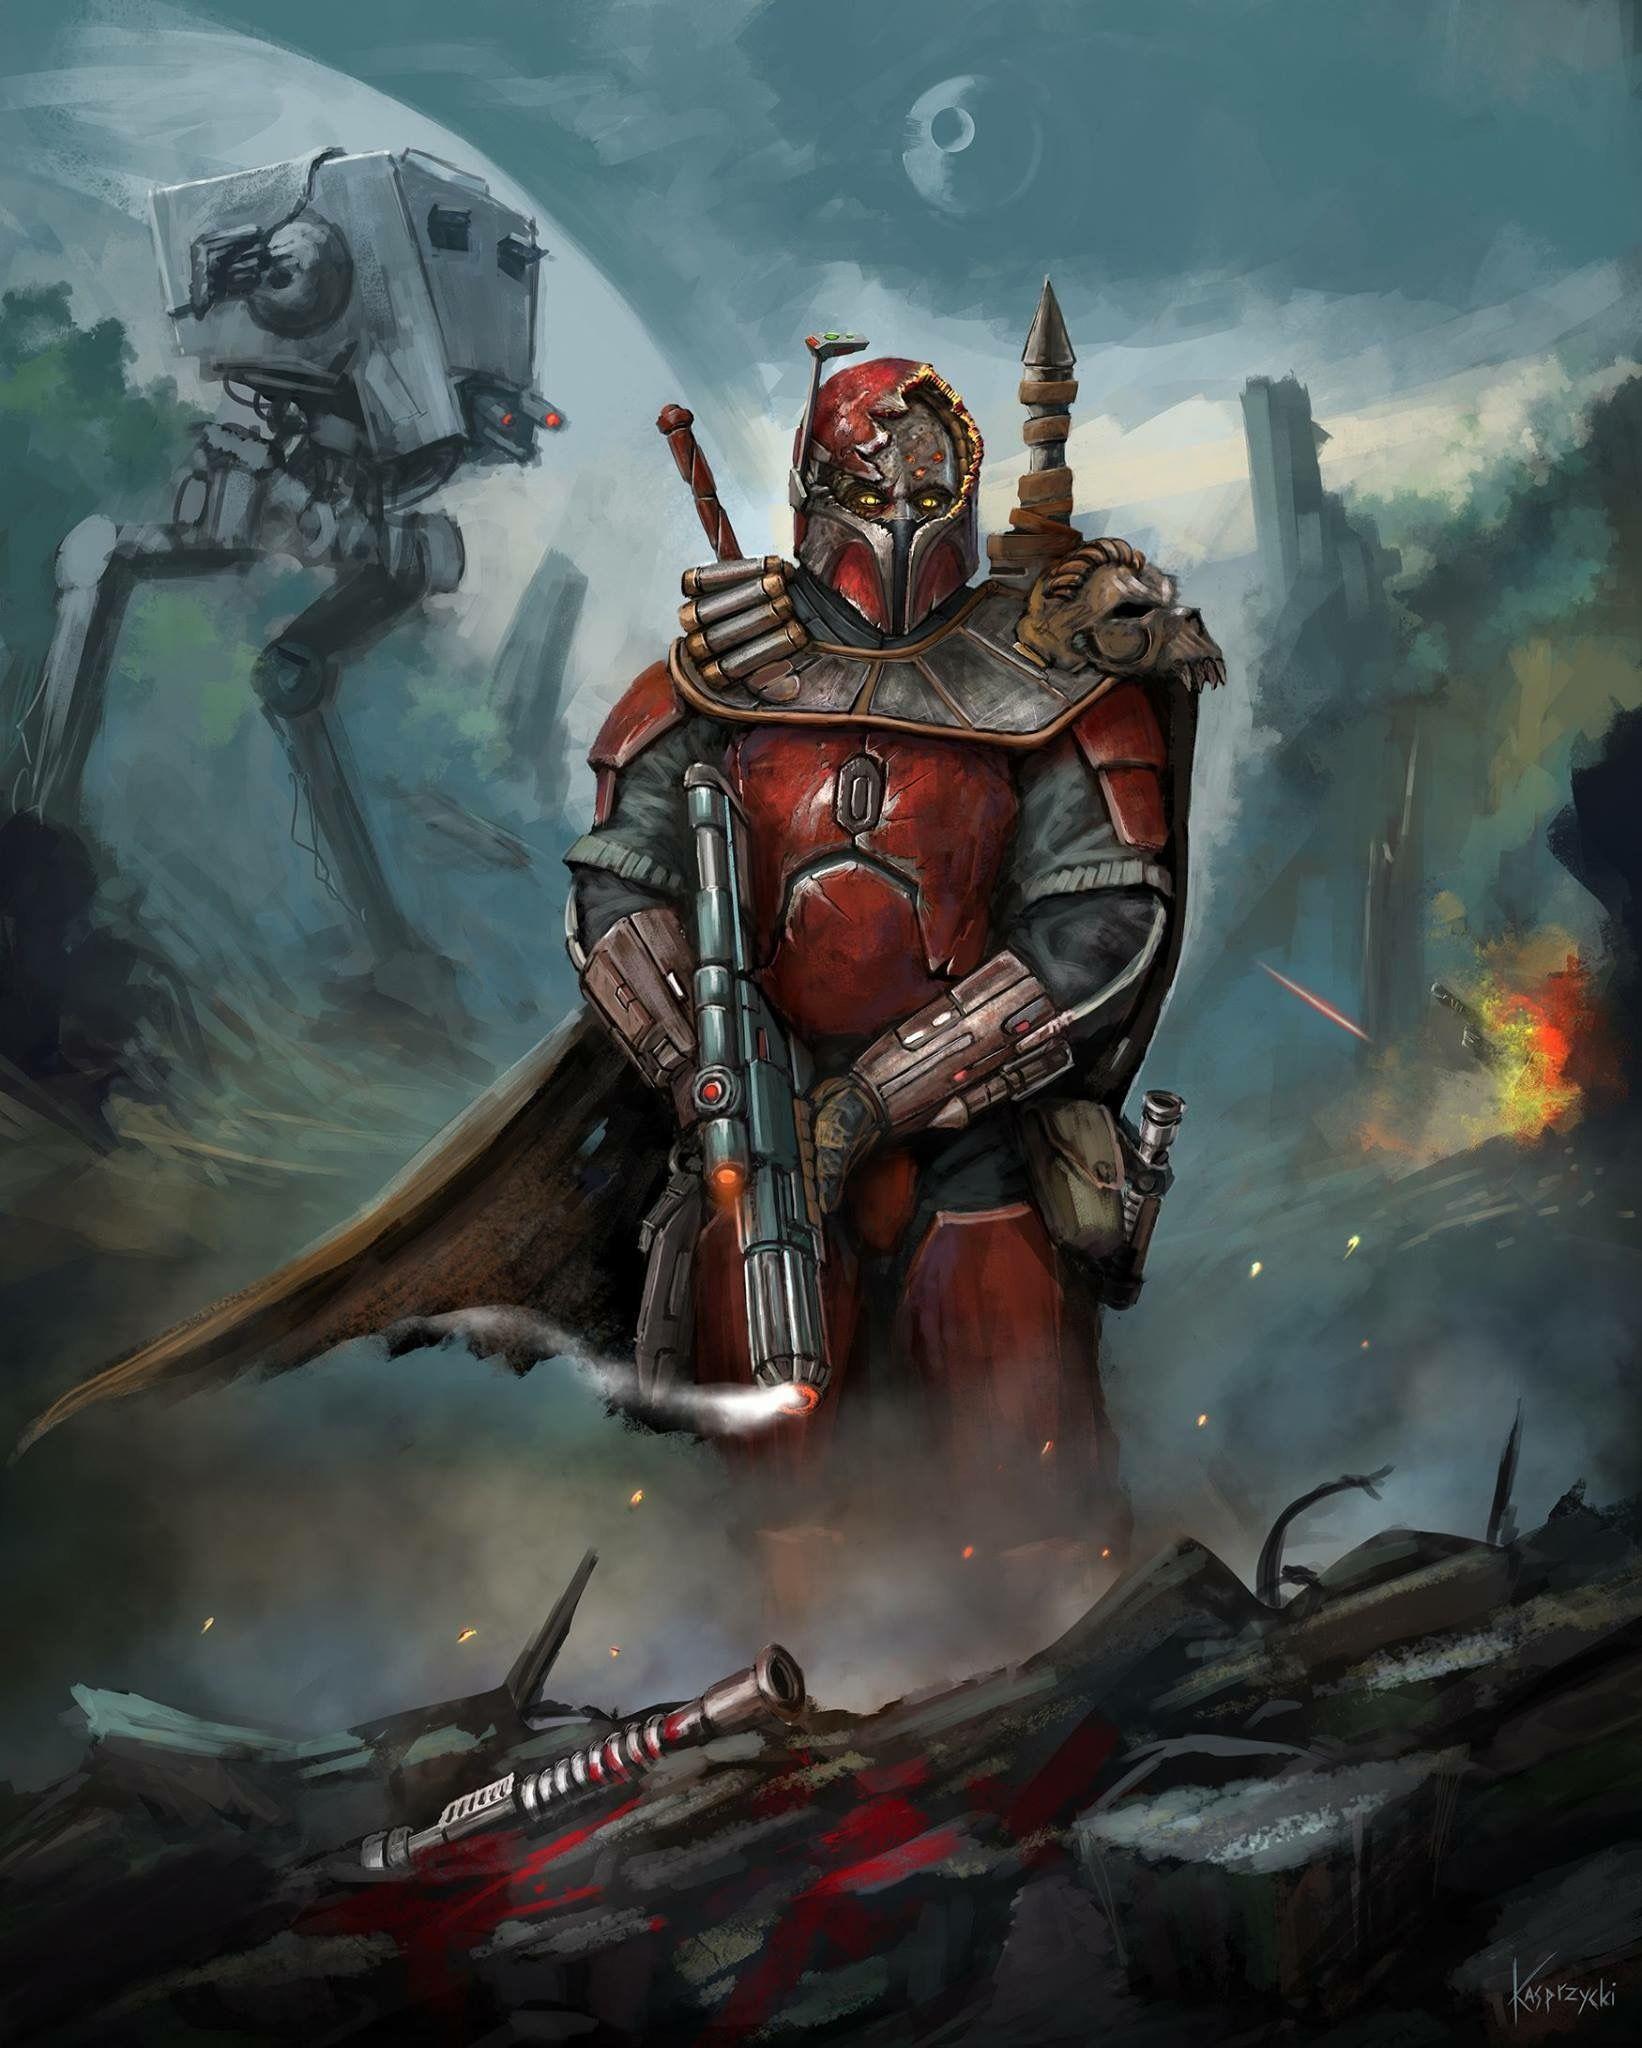 Mandalorian Star wars artwork, Star wars images, Star